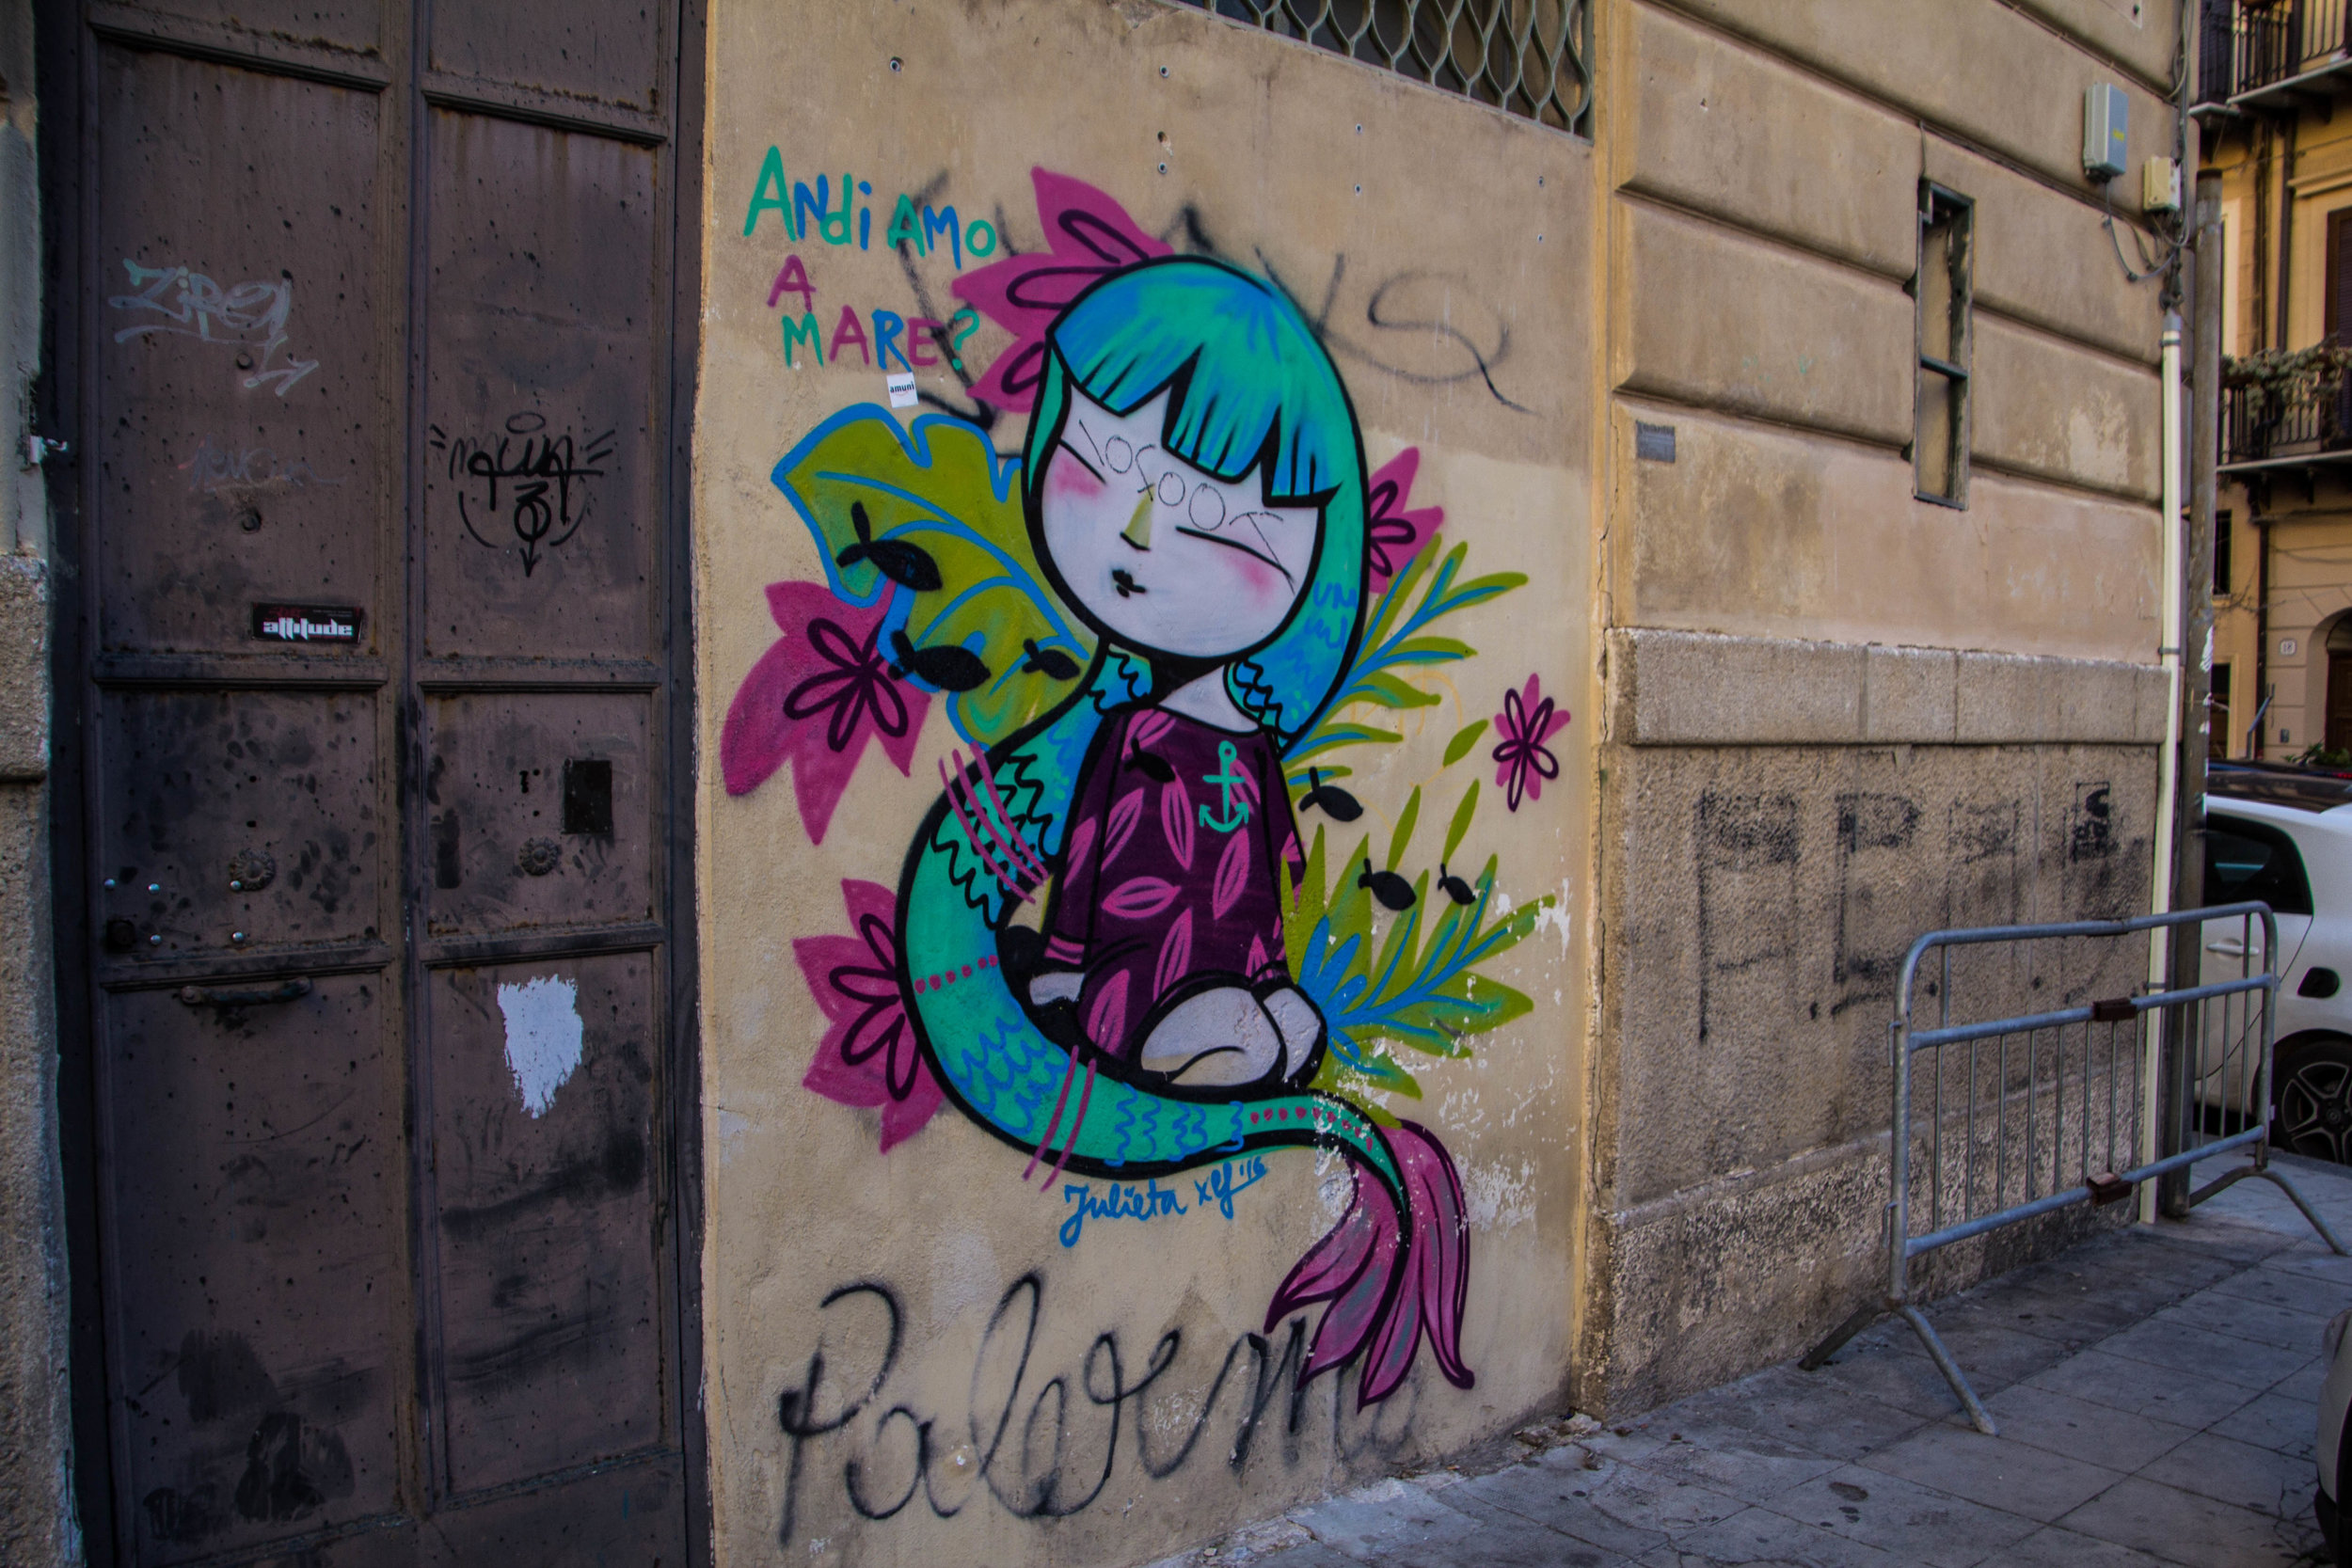 street-art-palermo-sicily-13.jpg